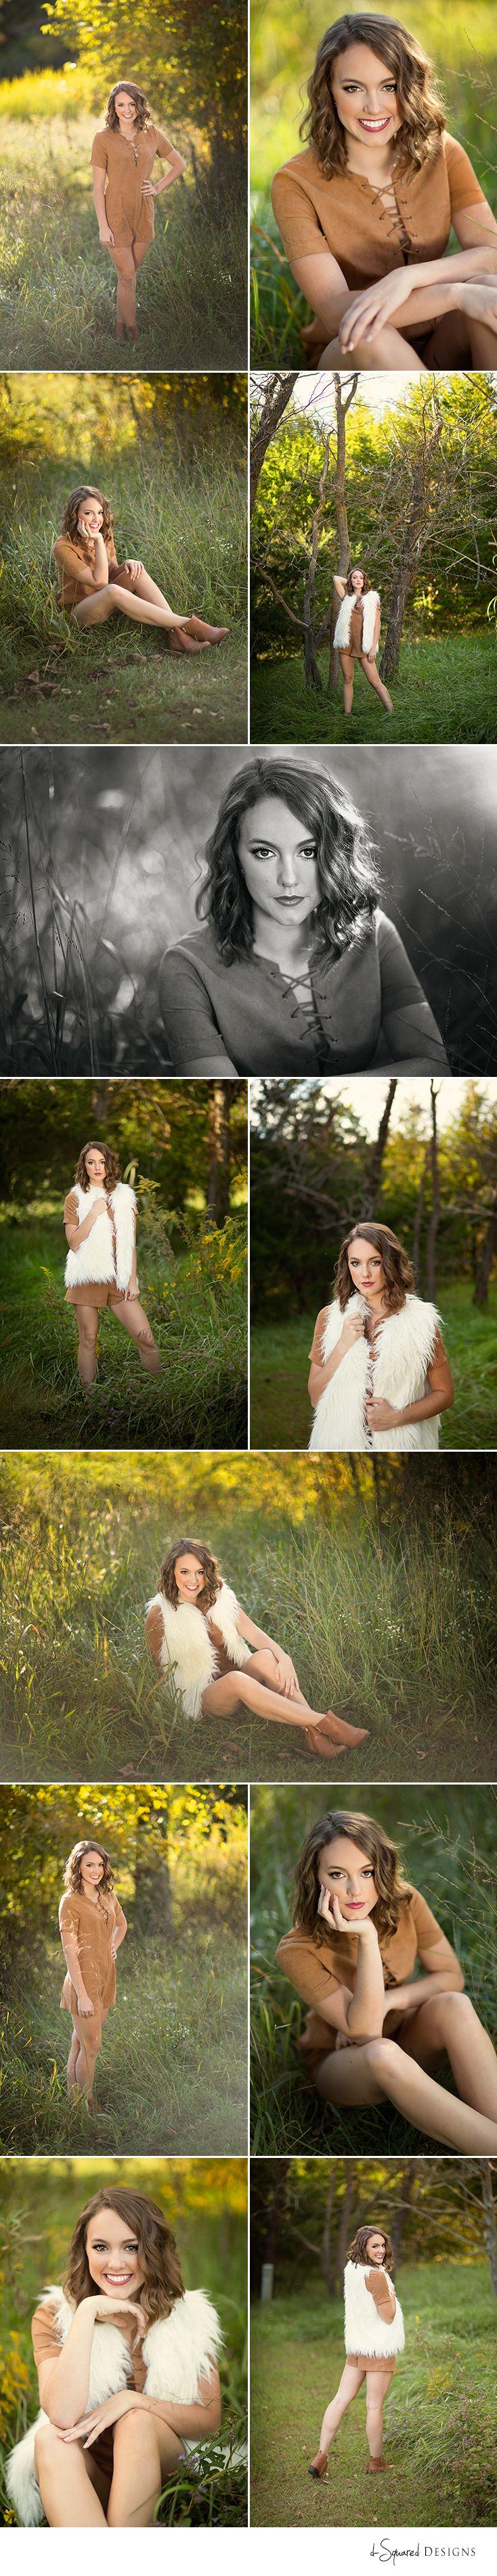 d-Squared Designs Columbia, MO Senior Photography. Fall senior photography. Senior girl photography. Posing ideas. Pretty girl senior.